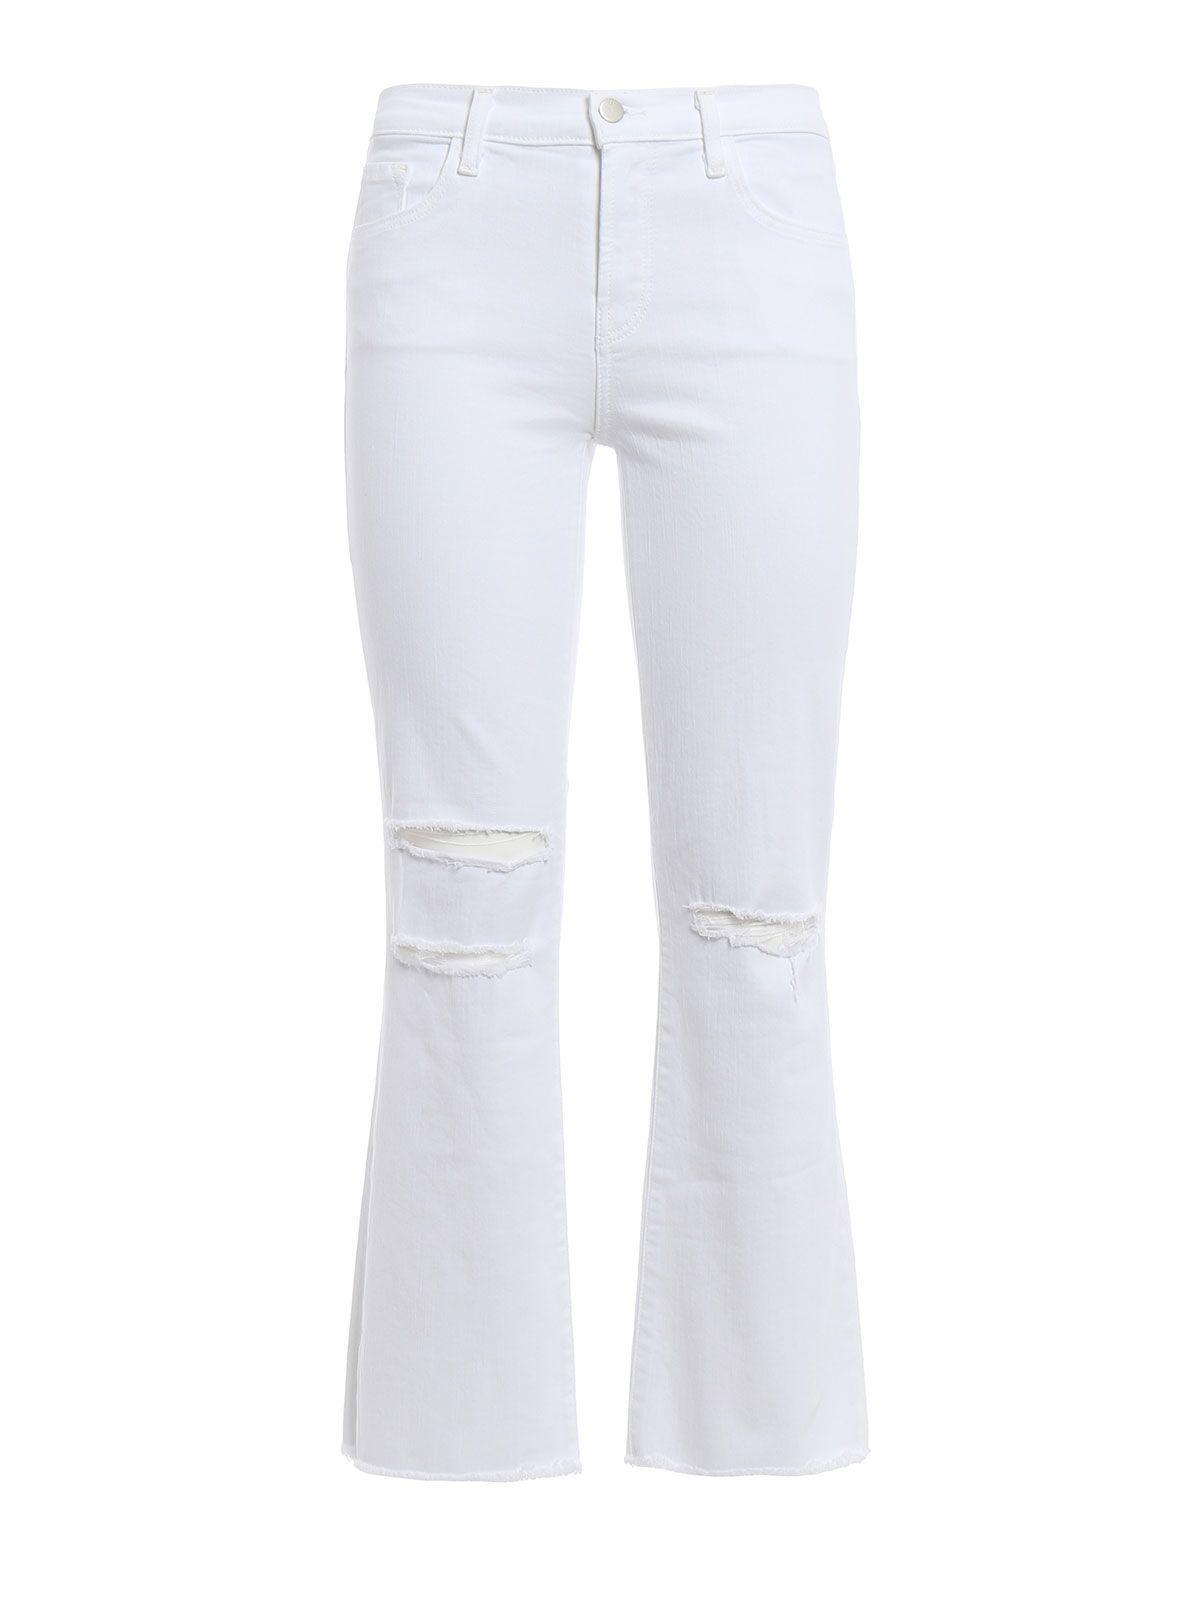 J Brand Selena Ripped Jeans In White